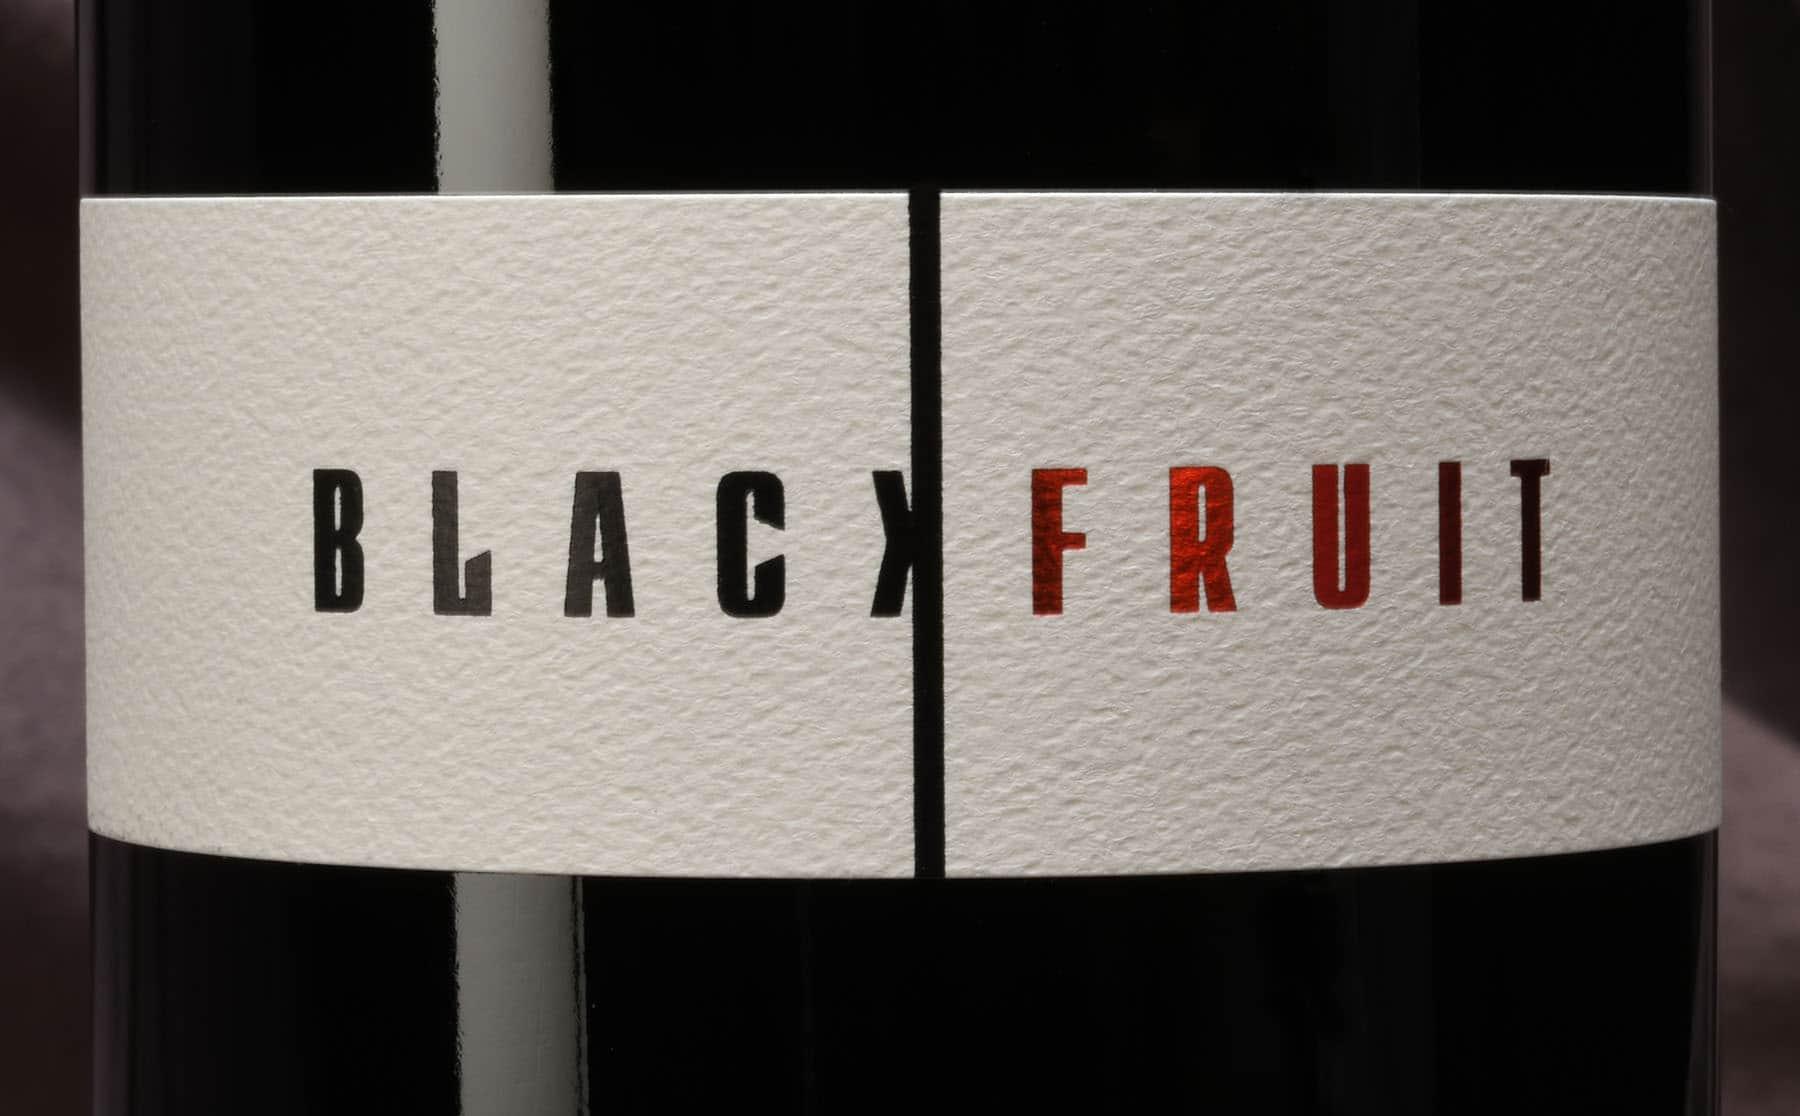 Cardano Black Fruit wine label